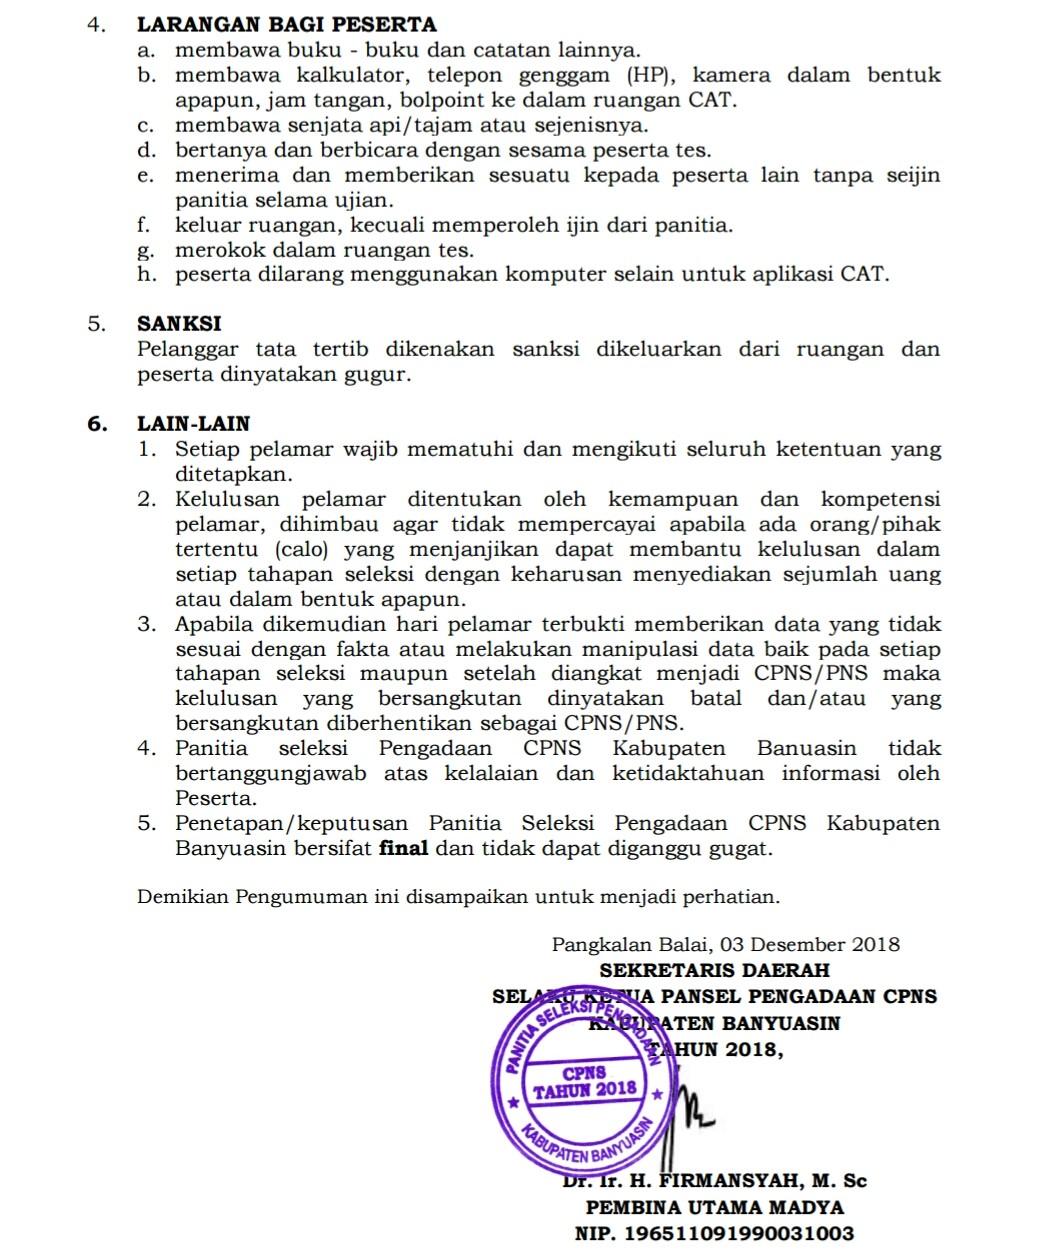 PENGUMUMAN JADWAL SELEKSI KOMPETENSI BIDANG KAB BANYUASIN TAHUN 2018(2)